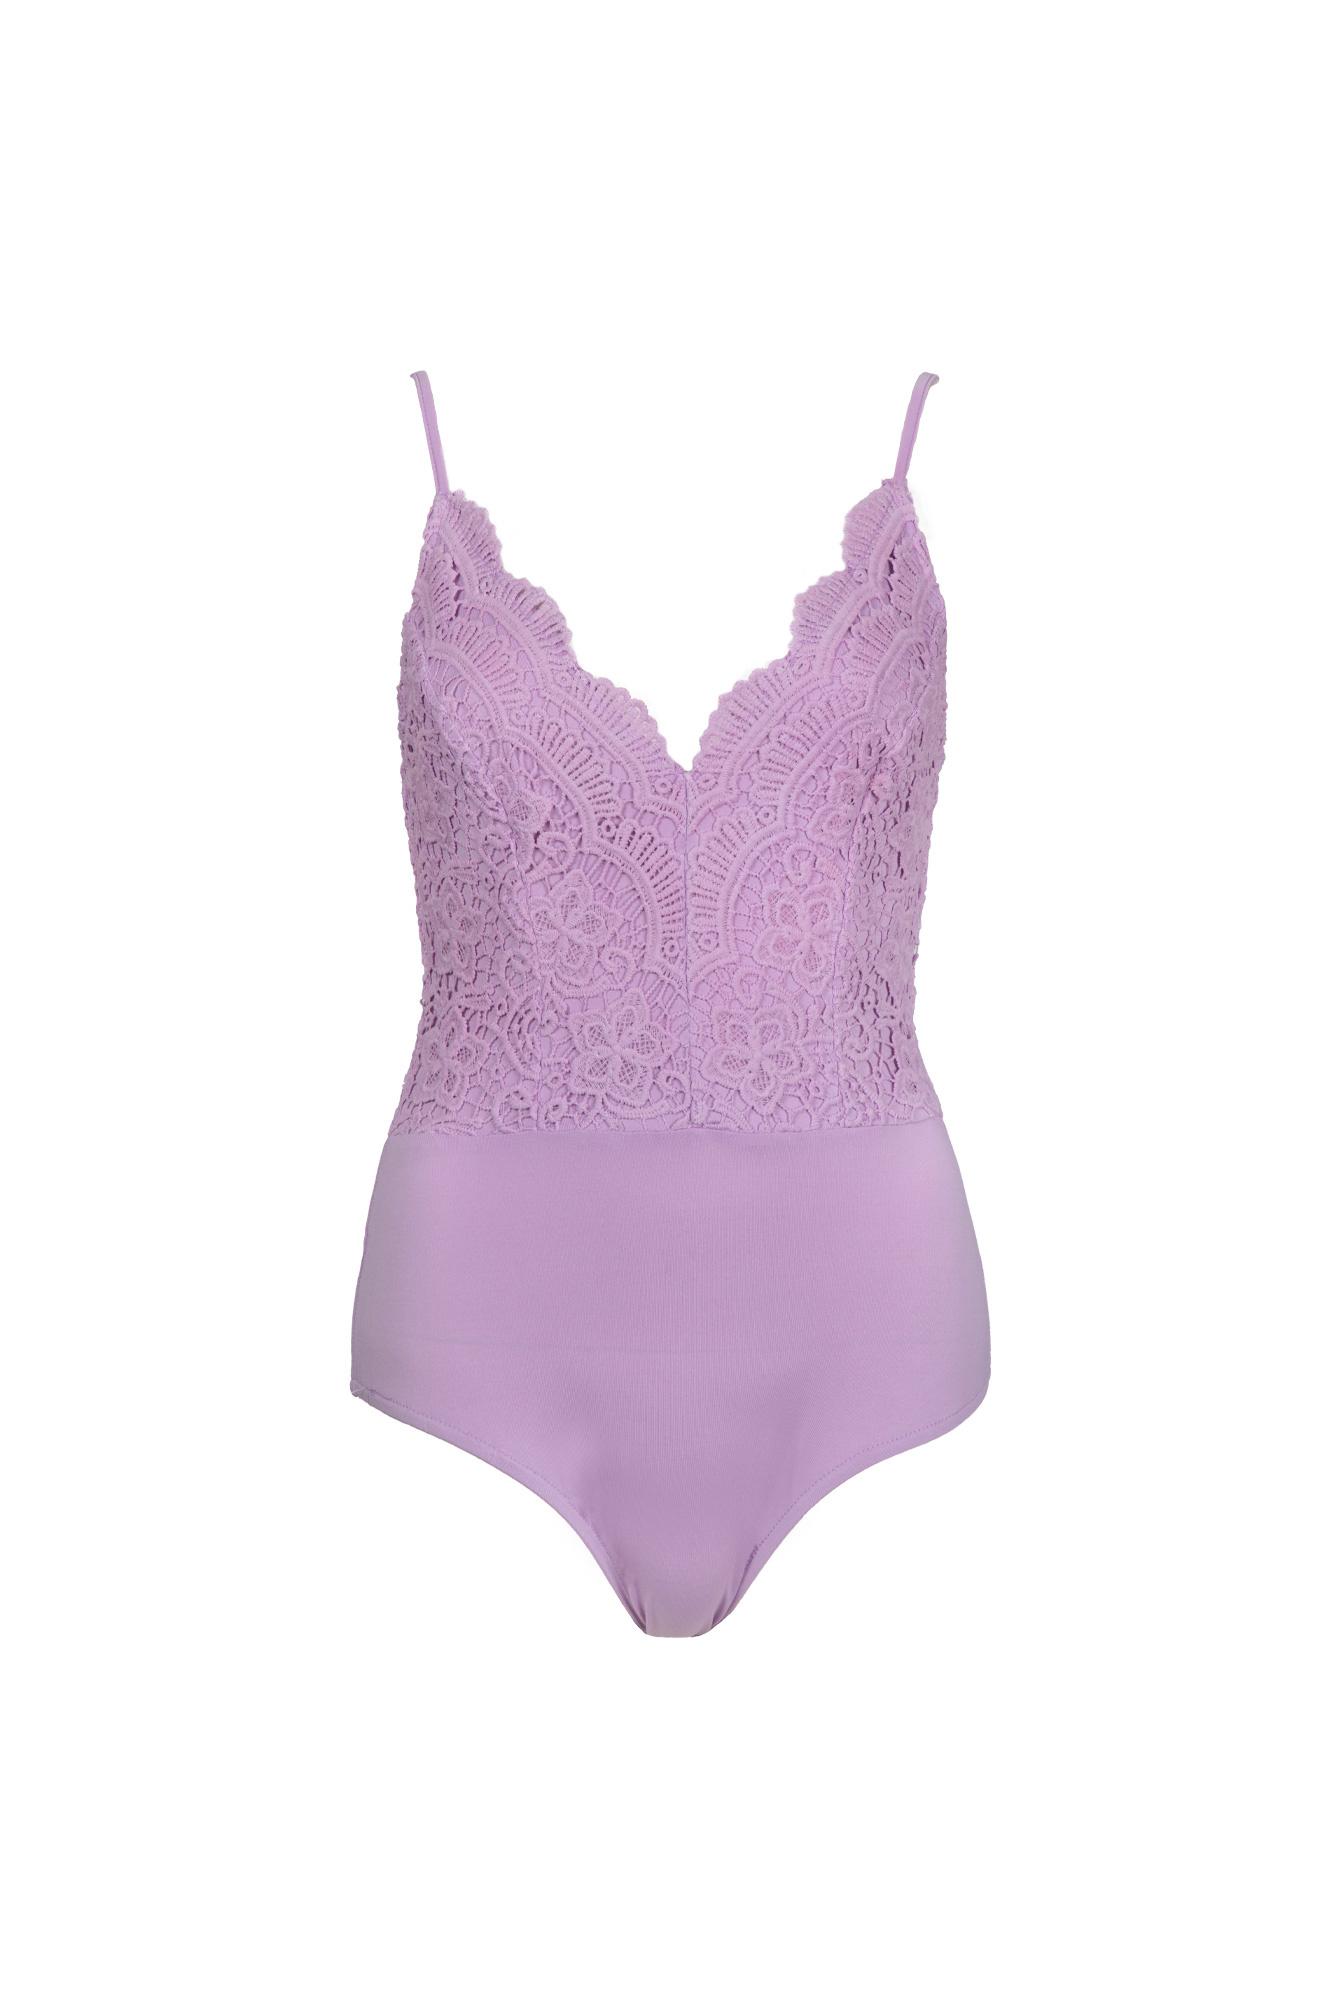 Body top lila